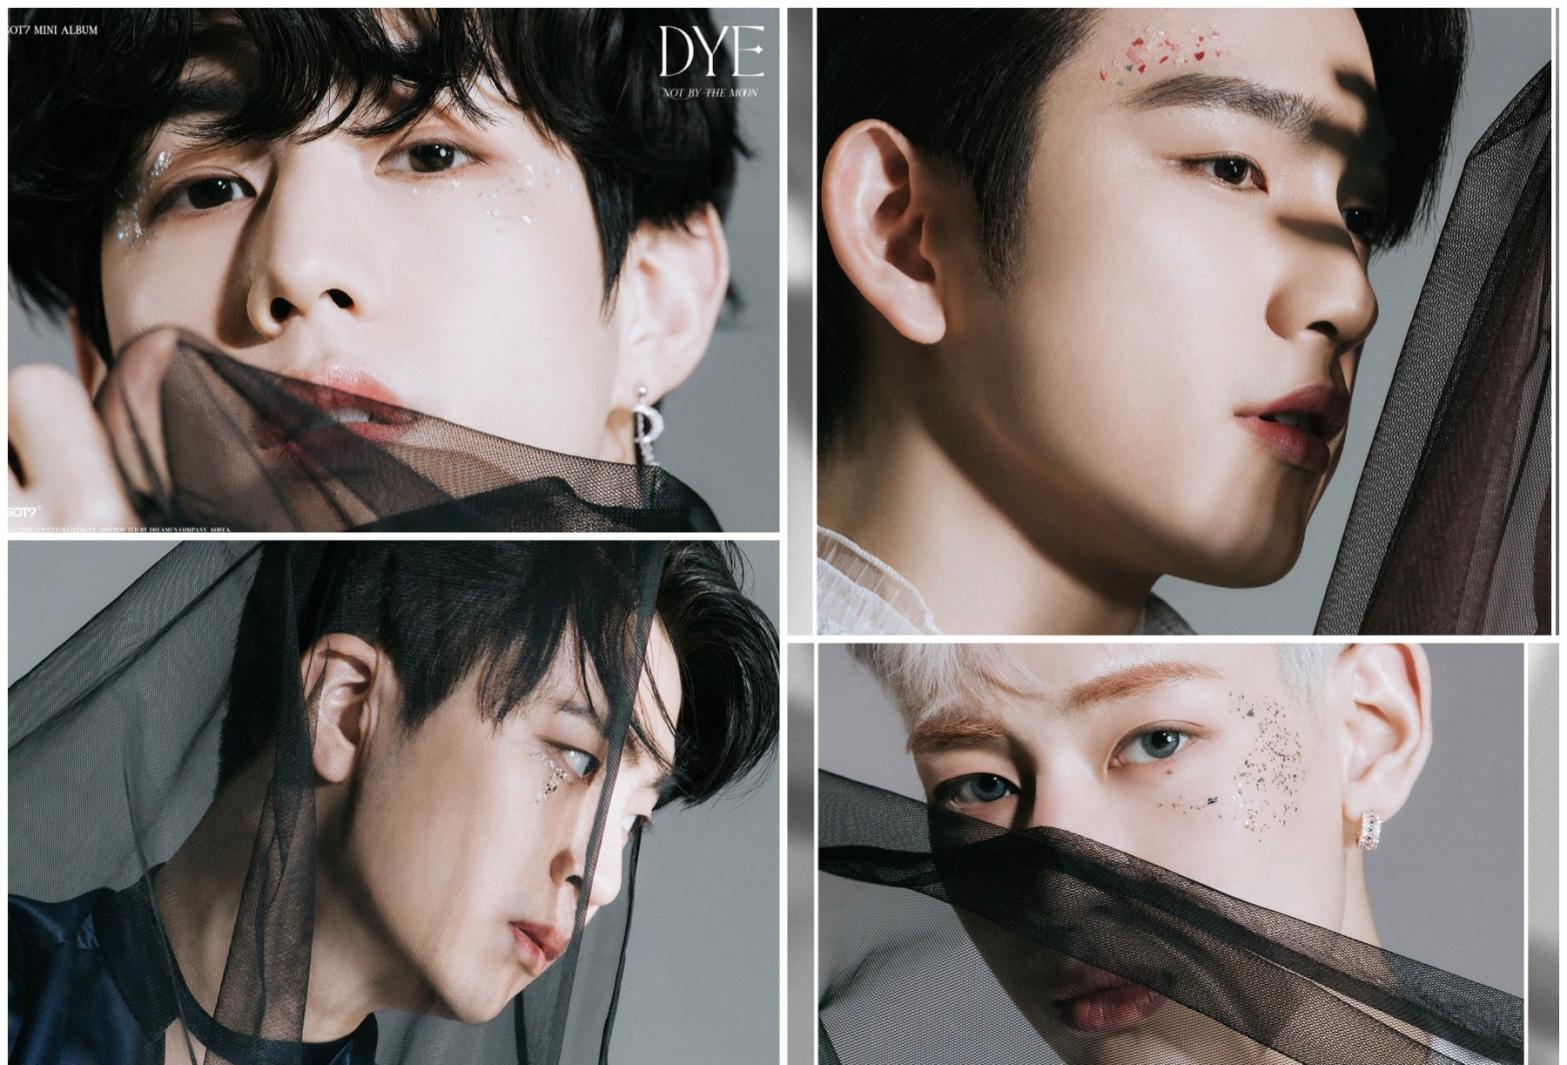 GOT7's fourth teaser image release for DYE